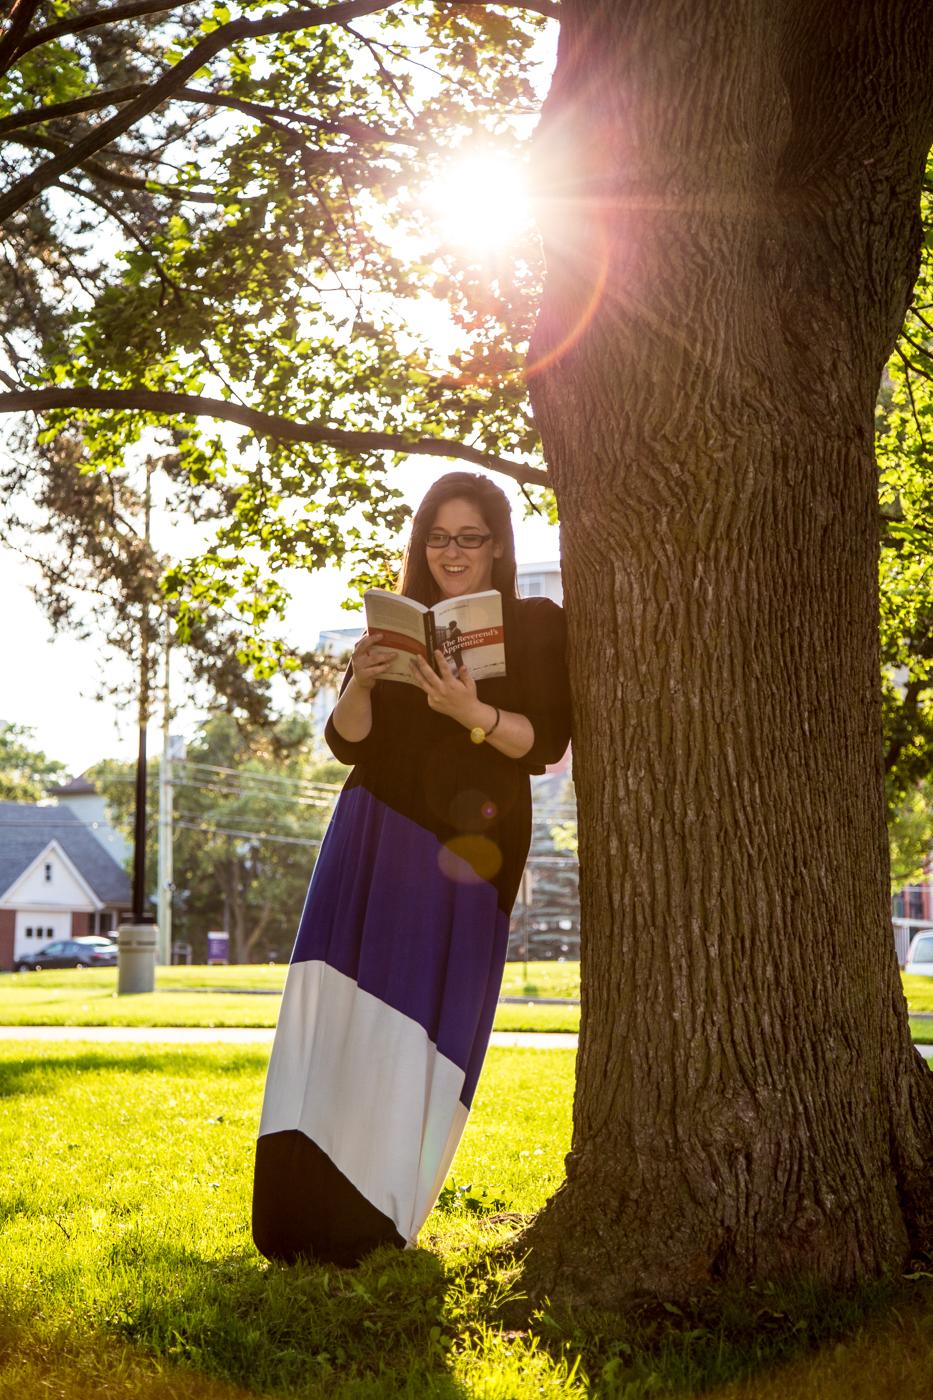 Summer bucket list: Watch, read and listen